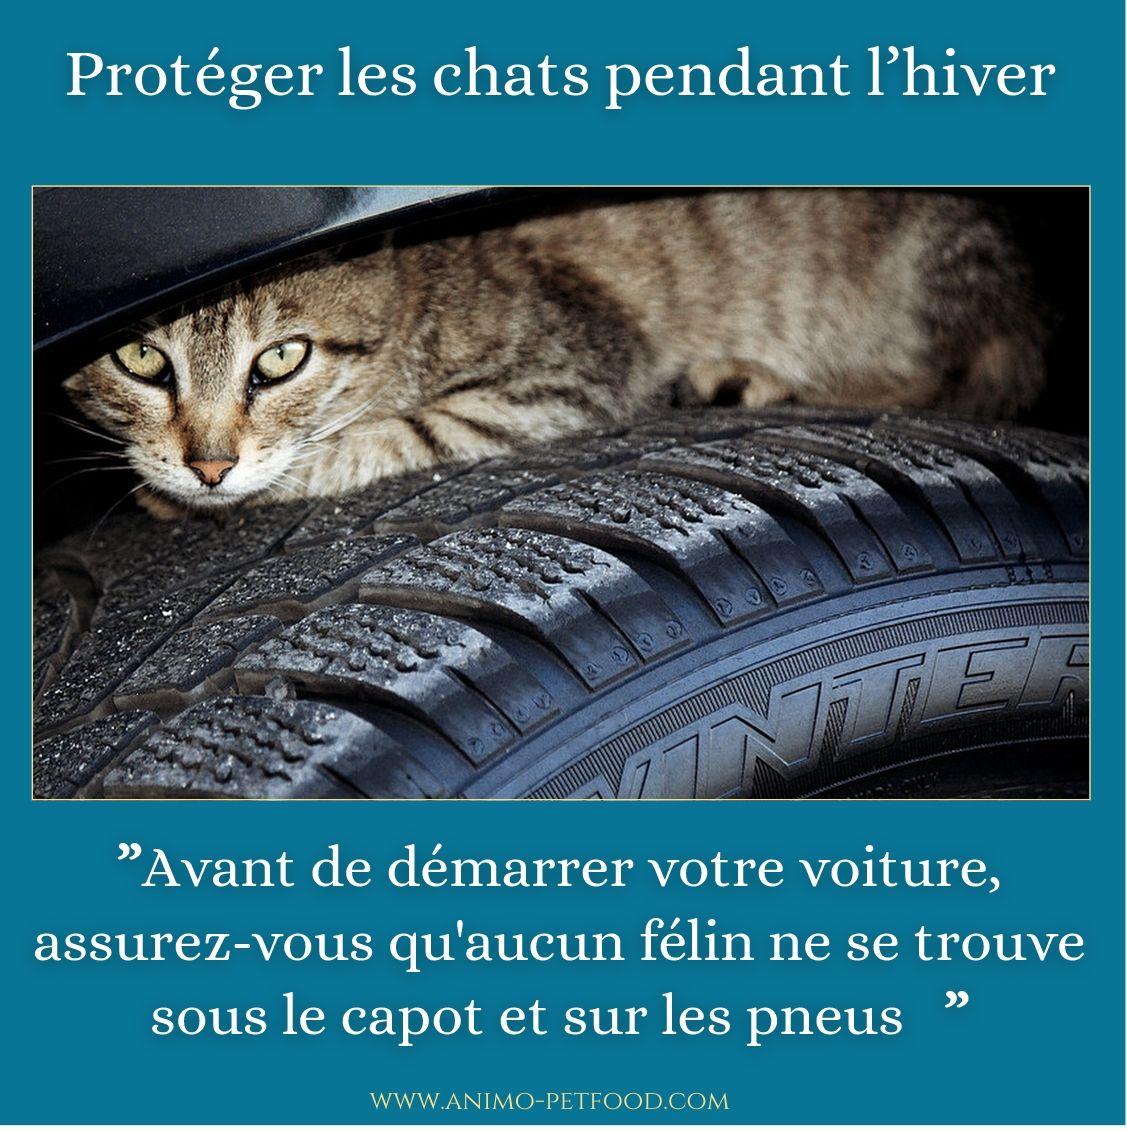 Proteger Les Chats Pendant L Hiver Chien Chat Chat Animaux